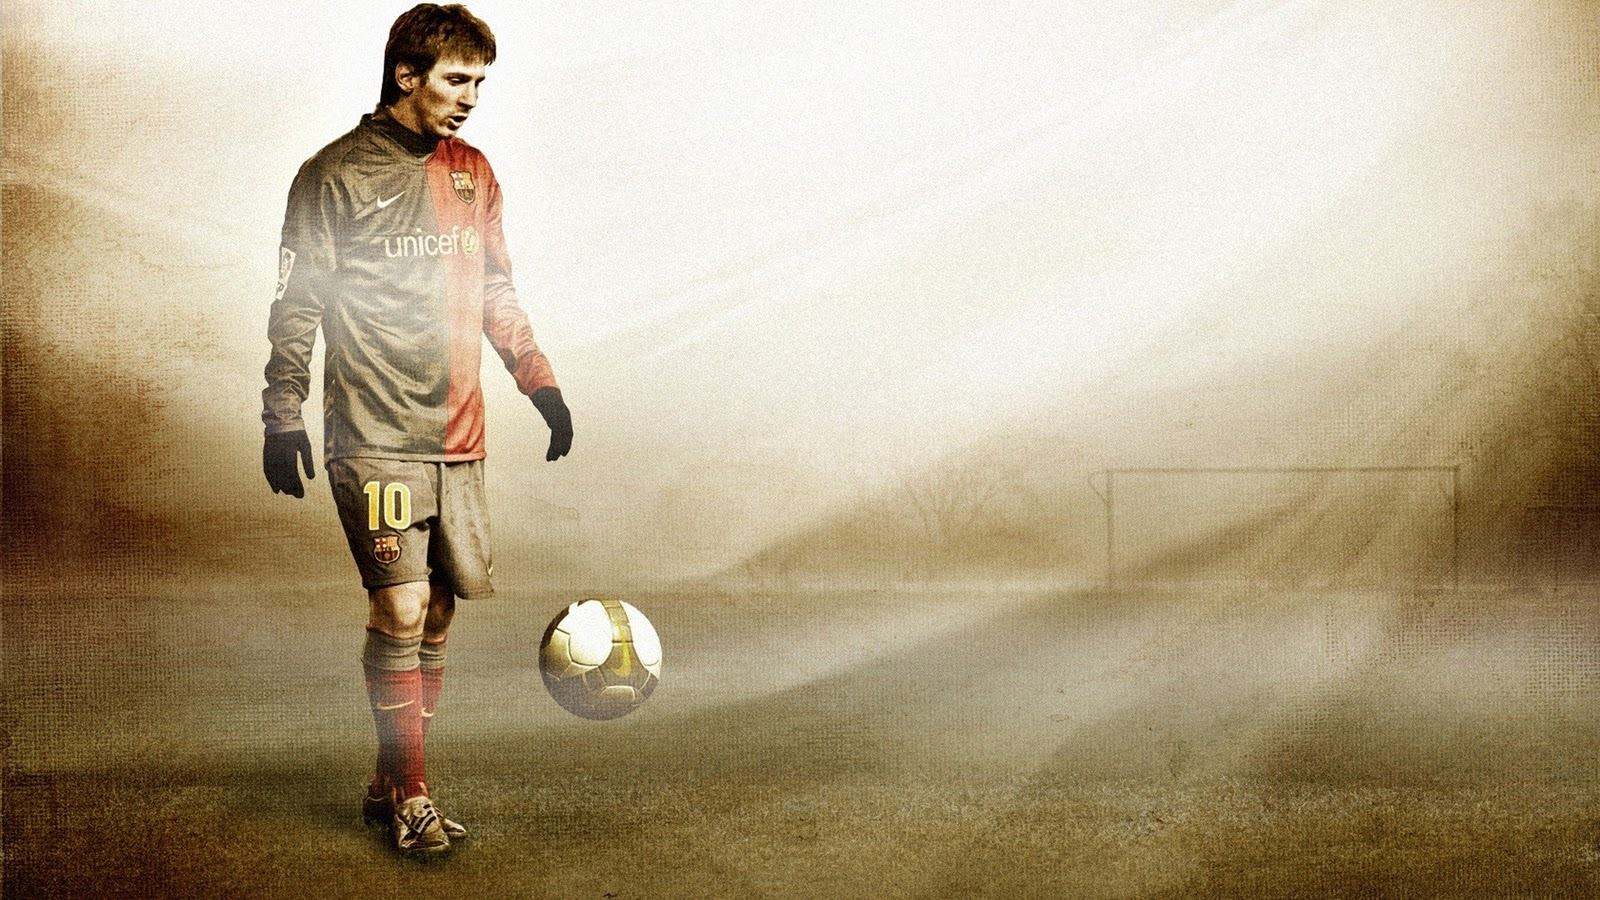 Lionel Messi HD Wallpapers Download Desktop Wallpaper Images 1600x900